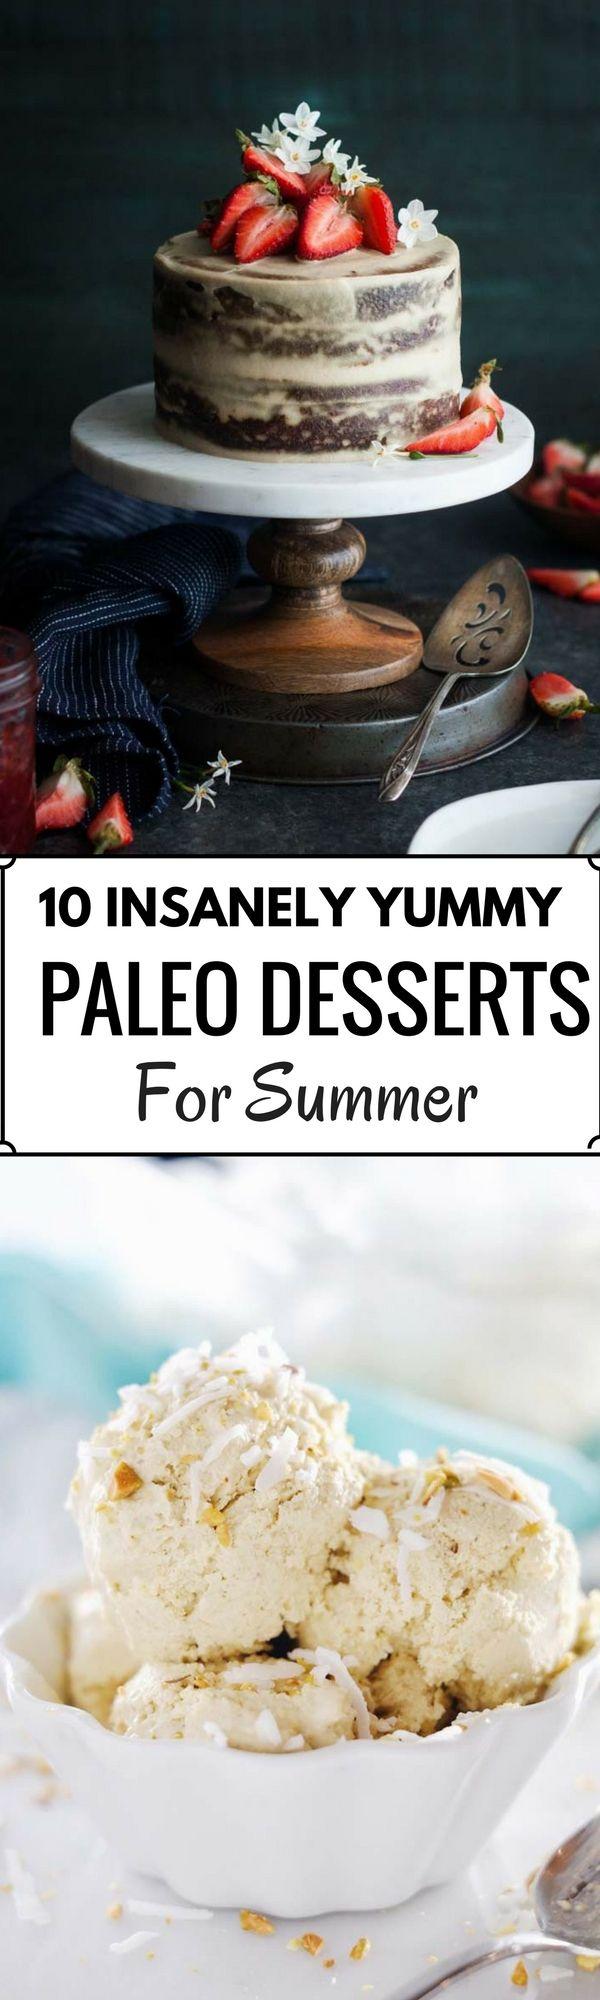 10 Insanely Delicious Paleo Summer Desserts Paleo Baking Paleo